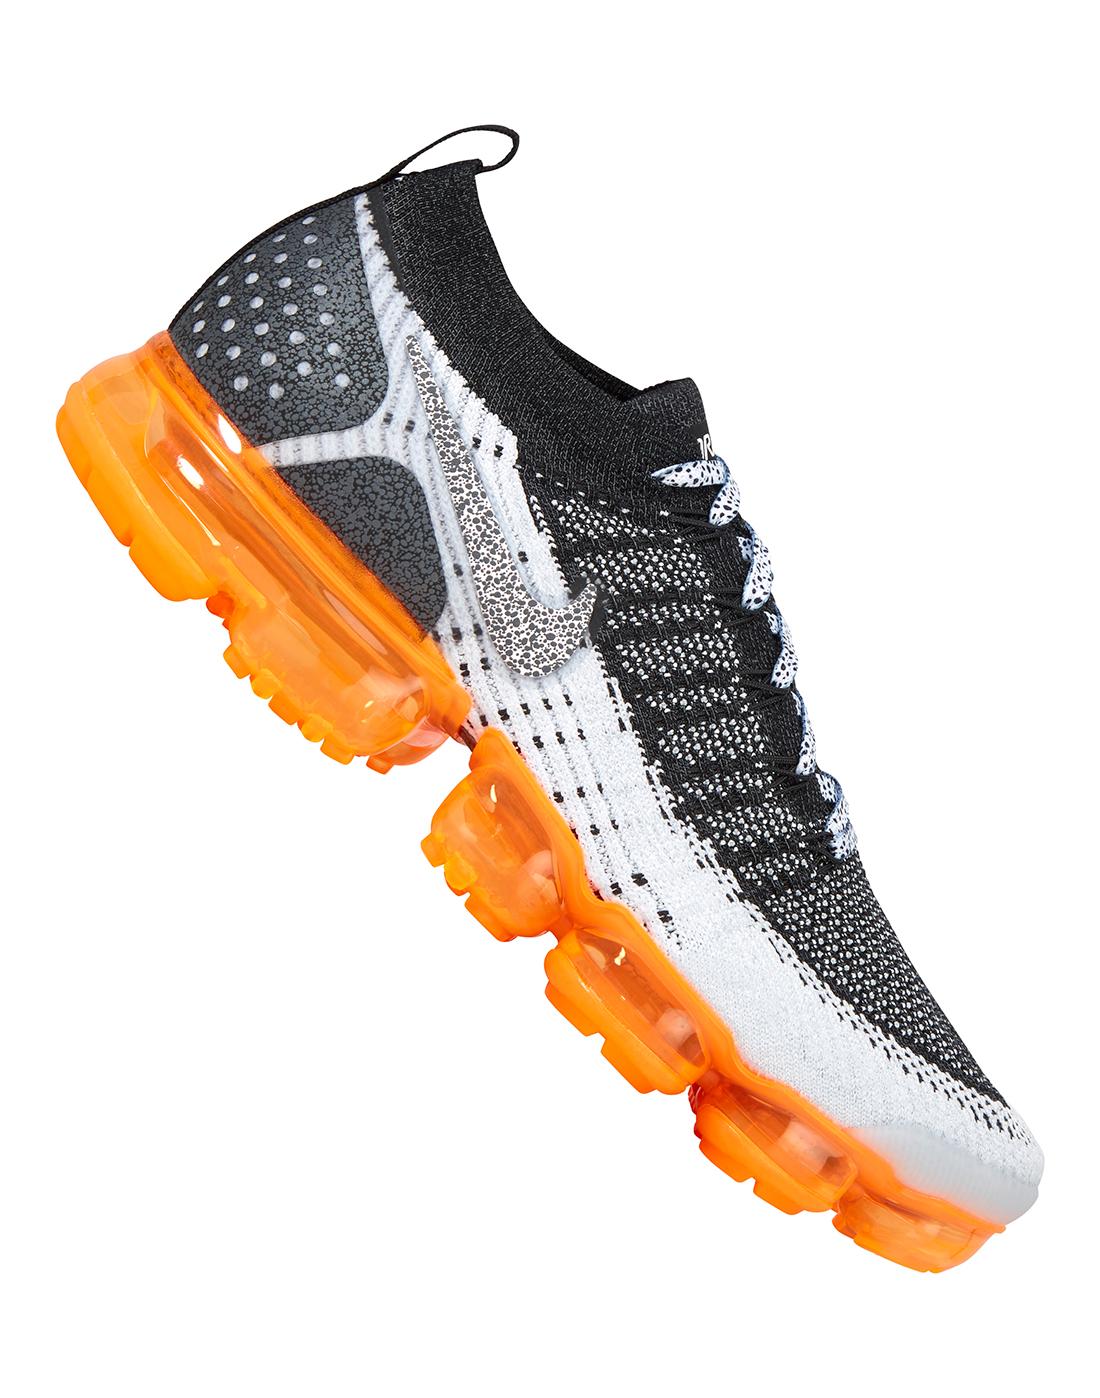 c40c2ad74be23 Men s Black   Orange Nike Vapormax Flyknit 2 Safari